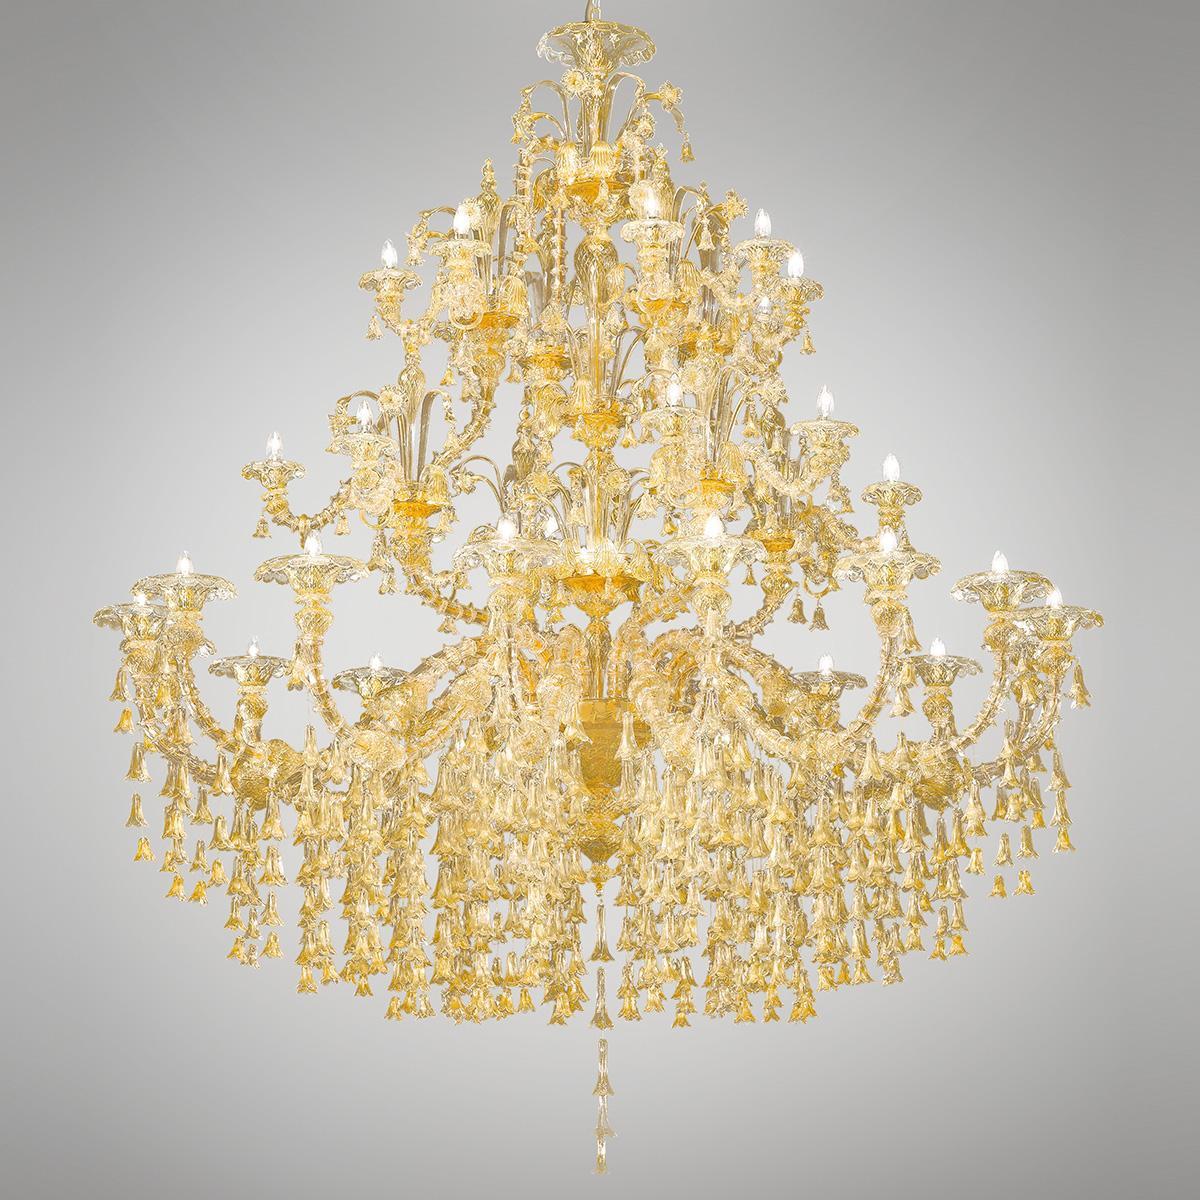 """Patrizia"" Murano glass chandelier - 32+8 lights - gold"